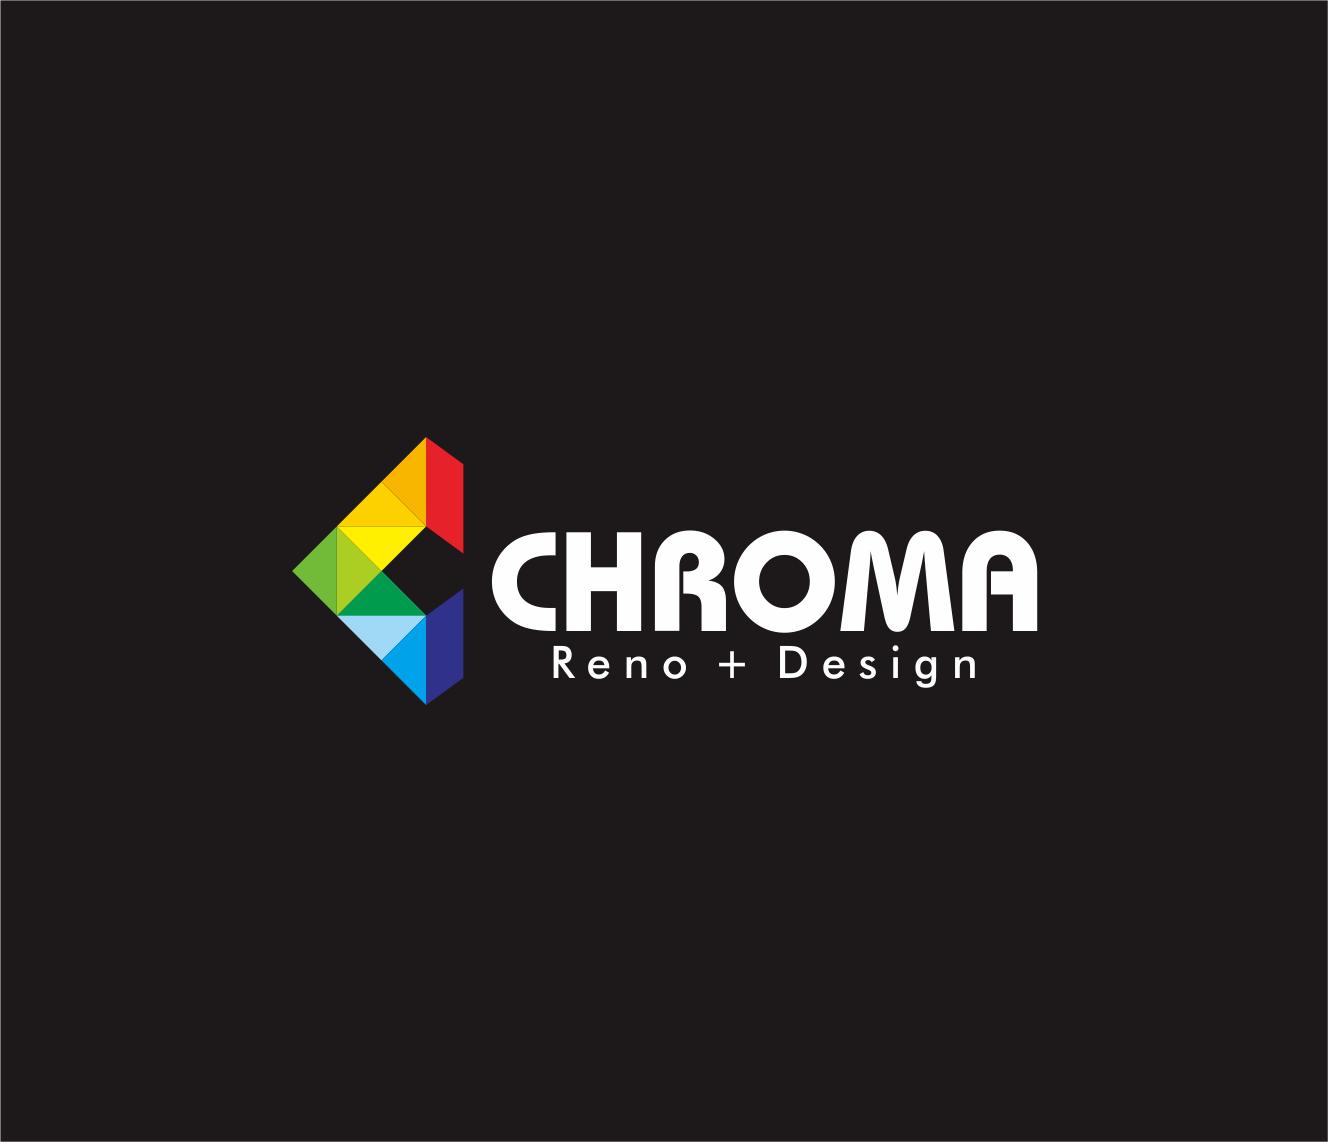 Logo Design by Armada Jamaluddin - Entry No. 202 in the Logo Design Contest Inspiring Logo Design for Chroma Reno+Design.